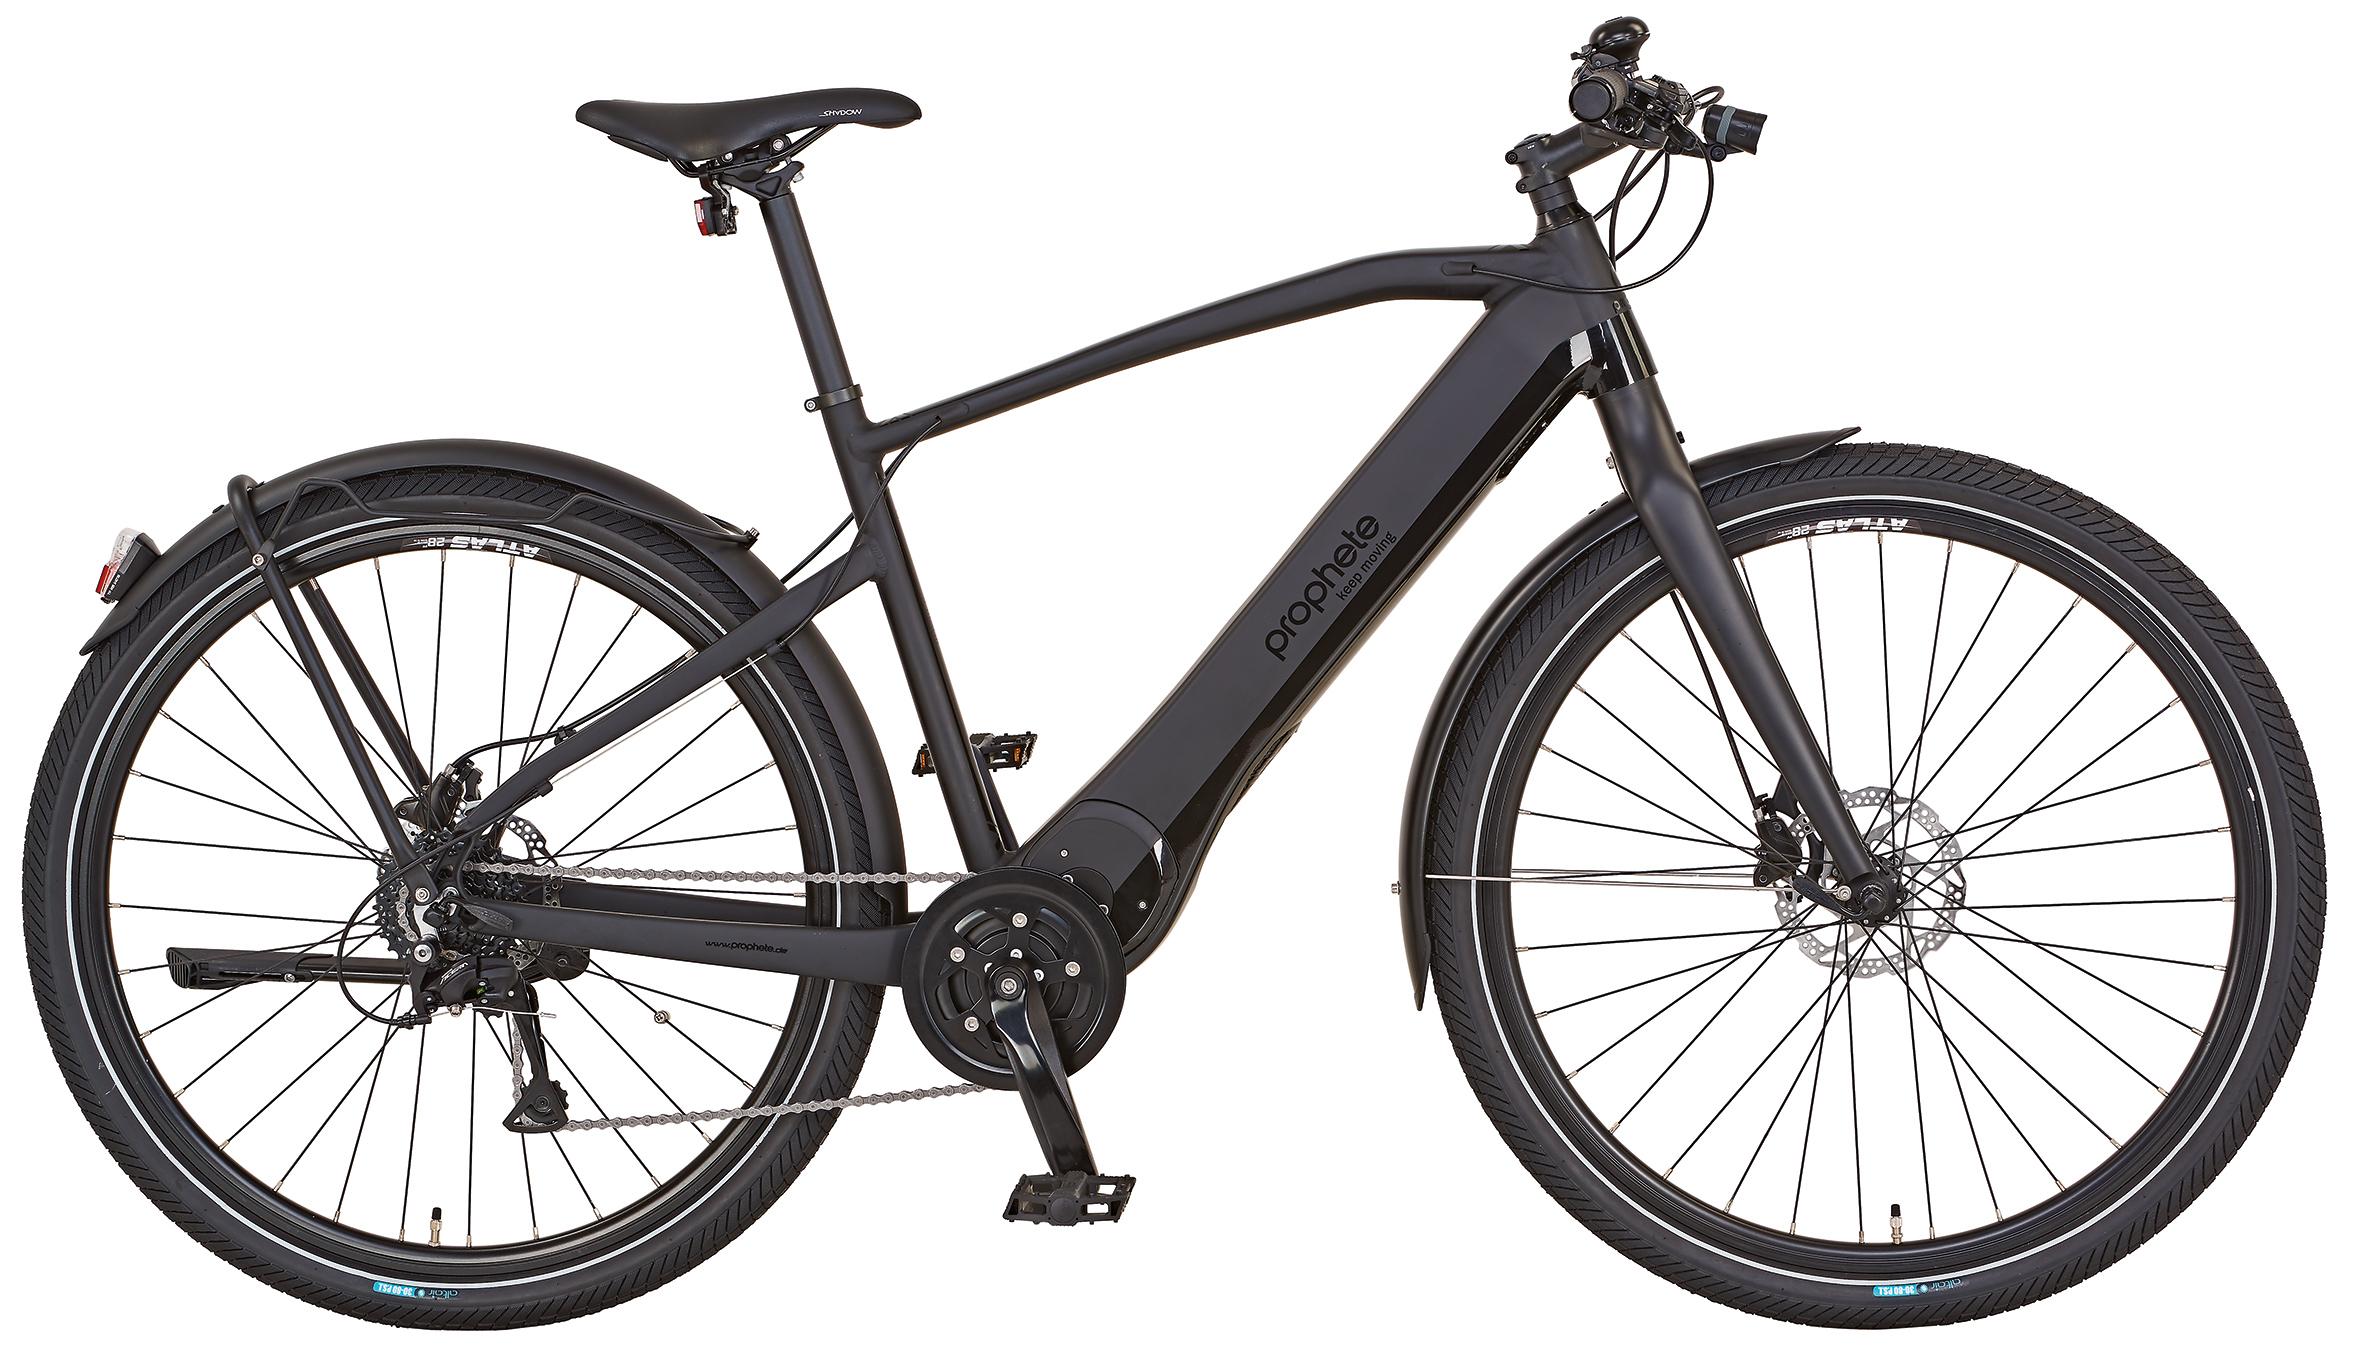 "Prophete Elektrofahrrad / E-Bike Geniesser e3.0 City E-Bike 28"" Bild 1"